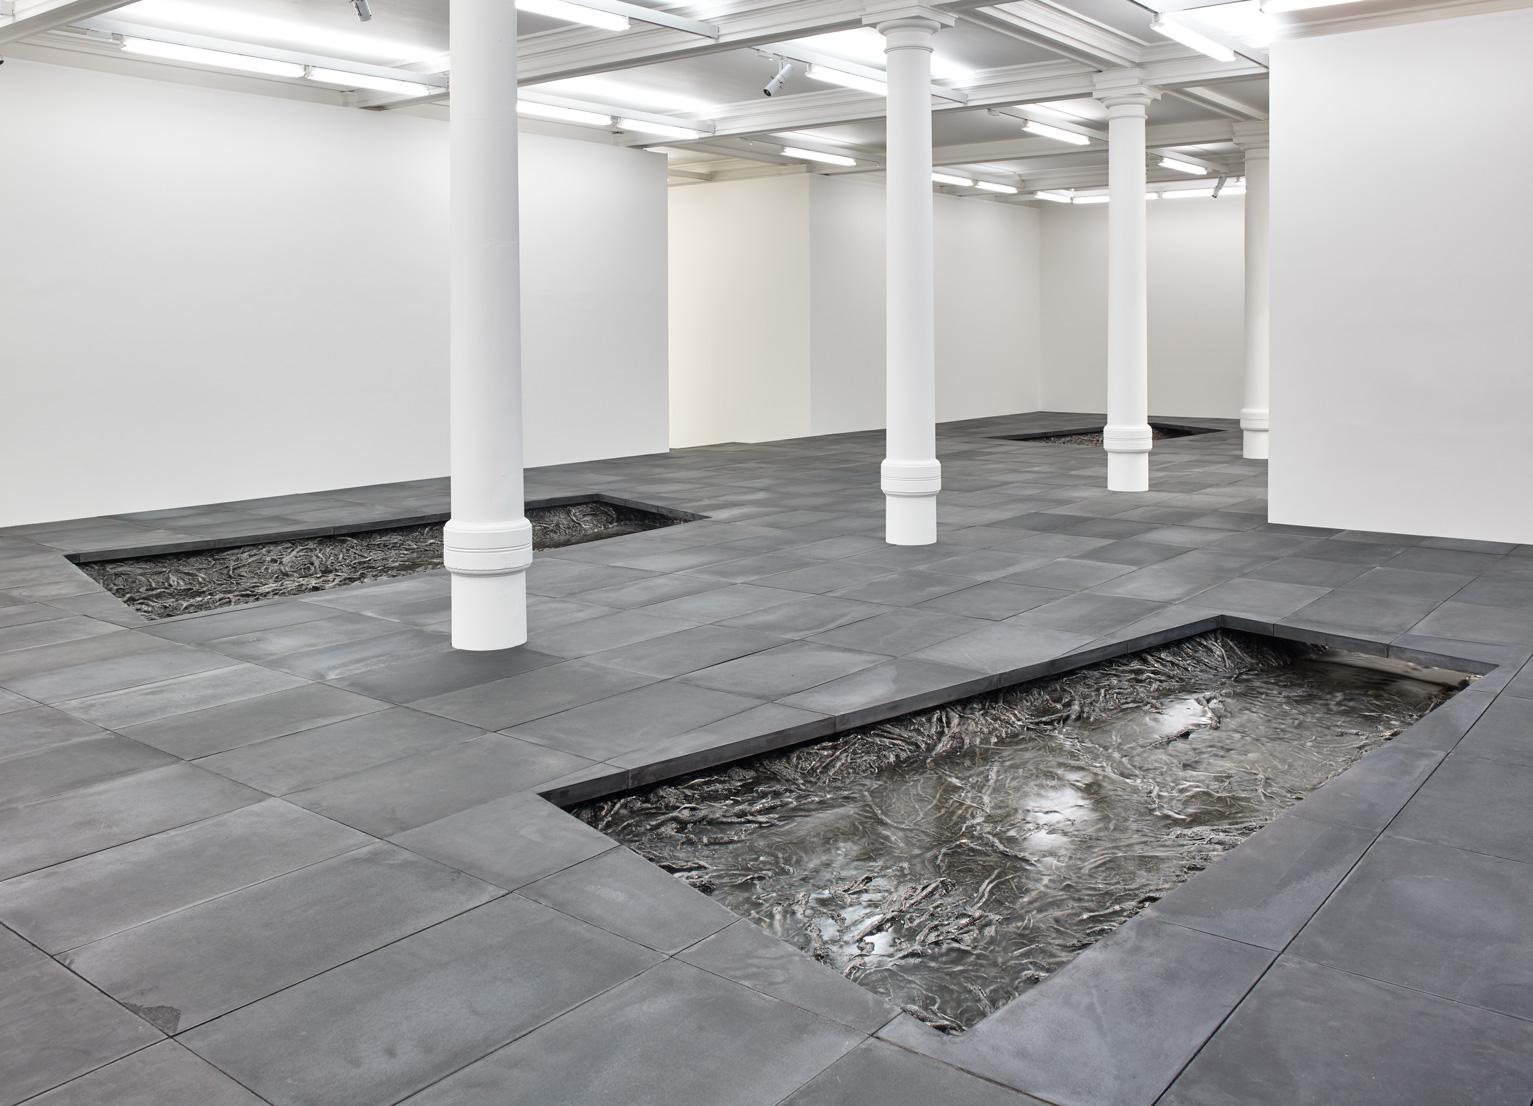 Phreatic Zones, Marian Goodman Gallery - London